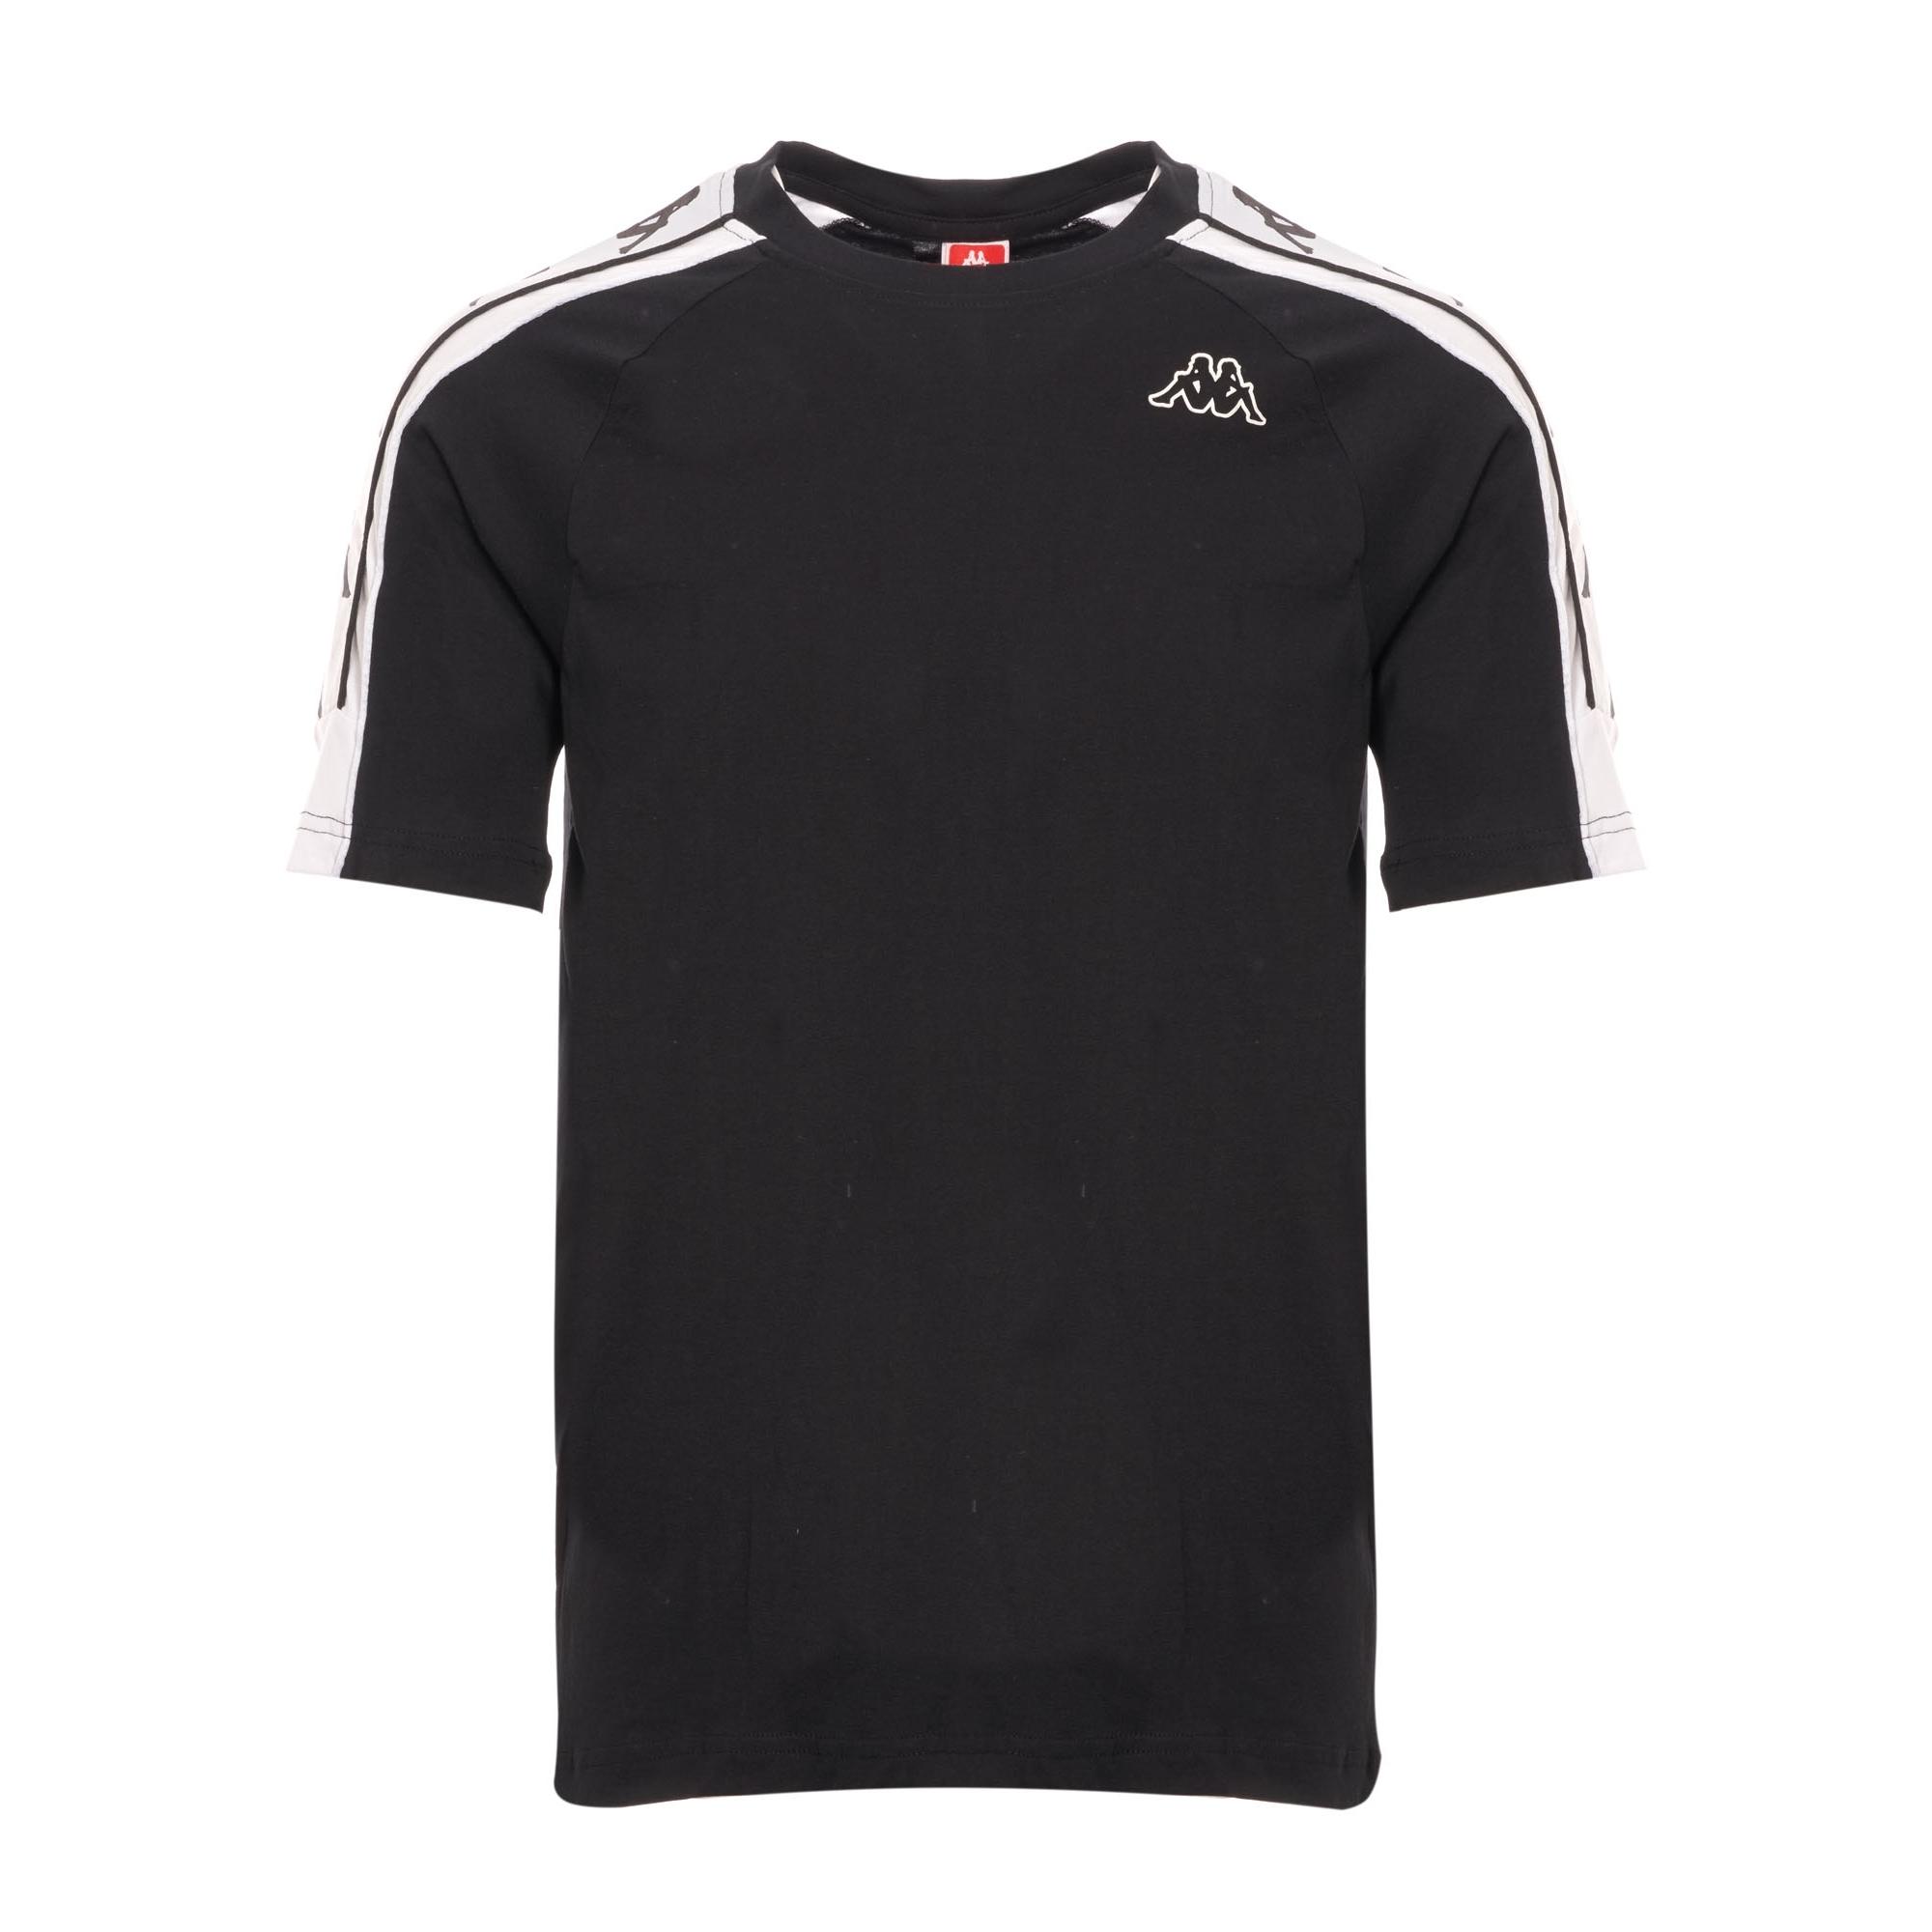 new product 6f382 5c9cd Banda Taped T-Shirt - Black & White